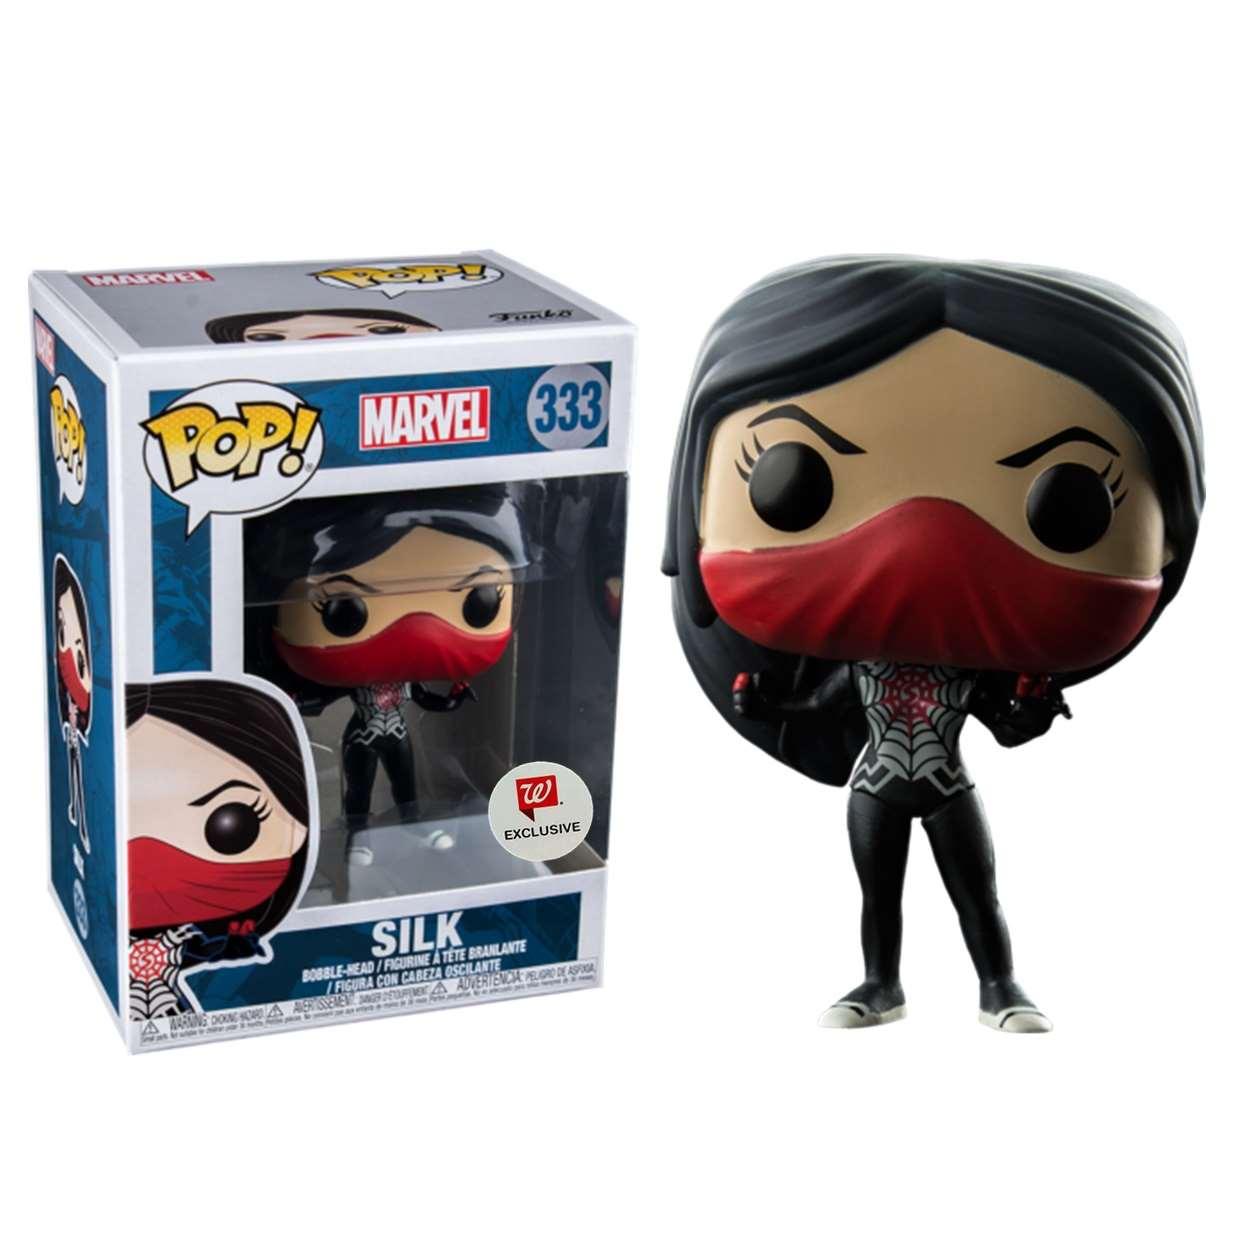 Silk #333 Figura Marvel Funko Pop! Exclusivo Walgreens